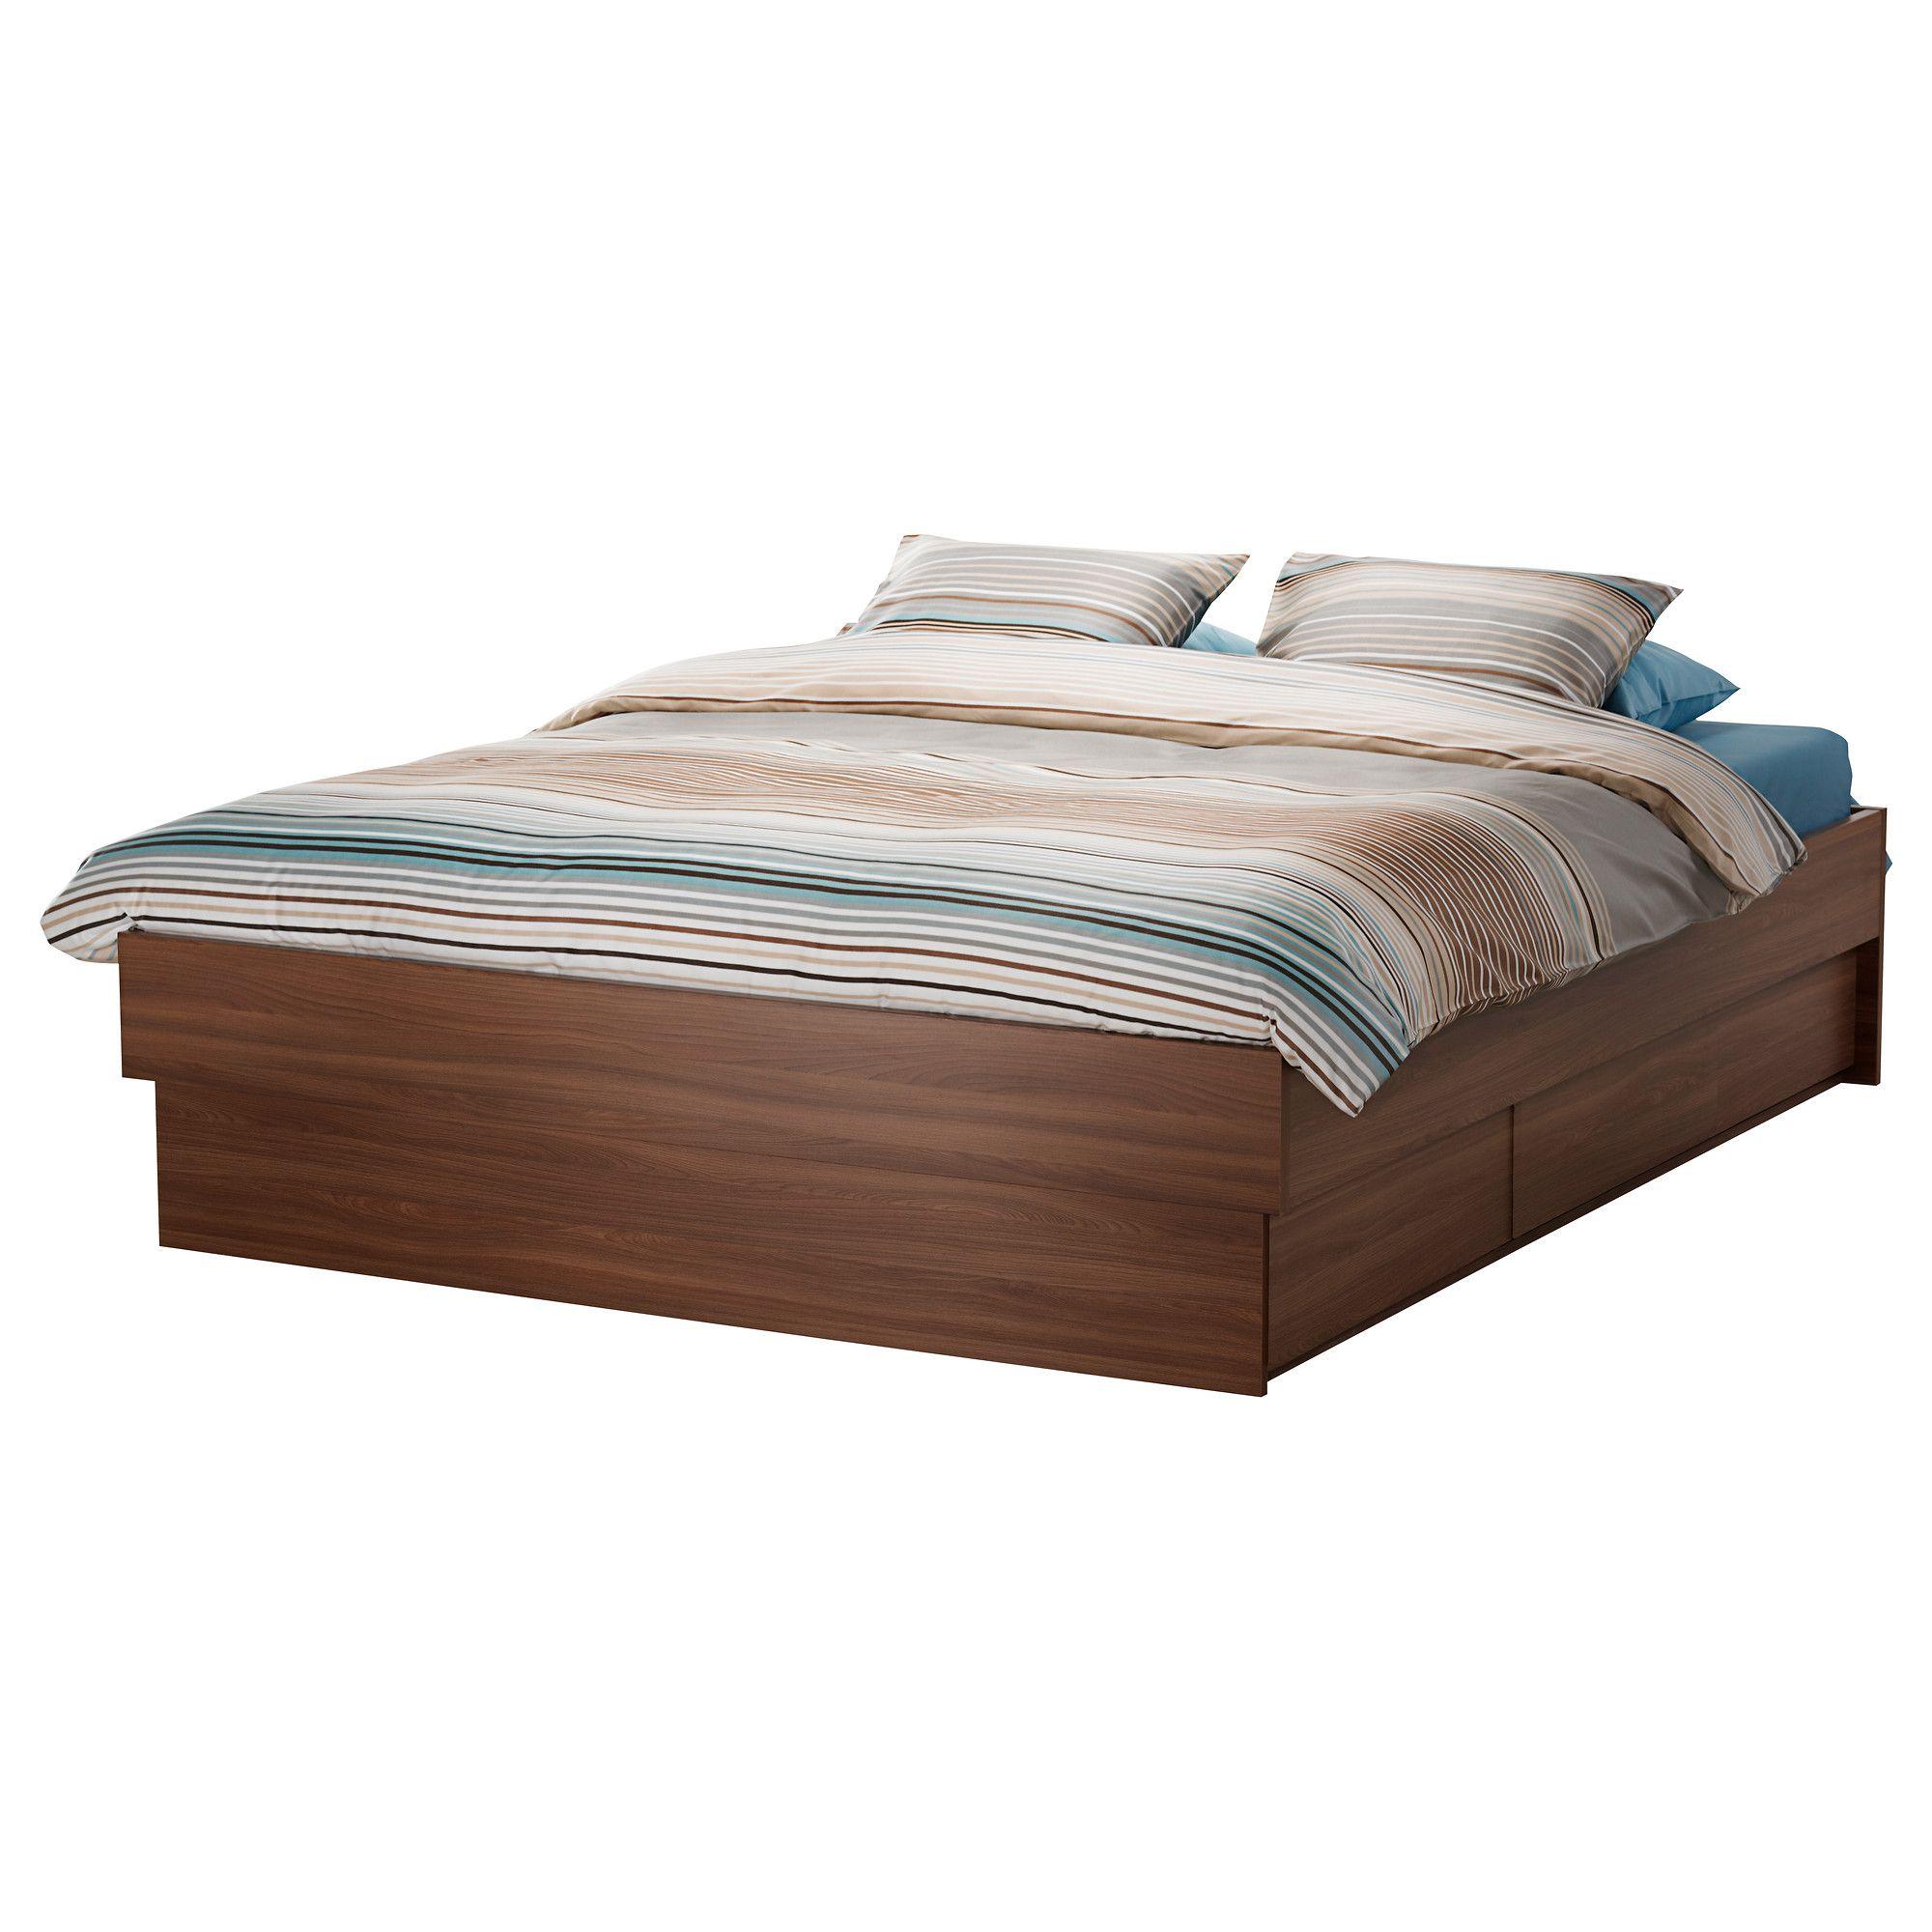 OPPDAL Lit avec rangement - brun moyen, Grand deux places - IKEA ...